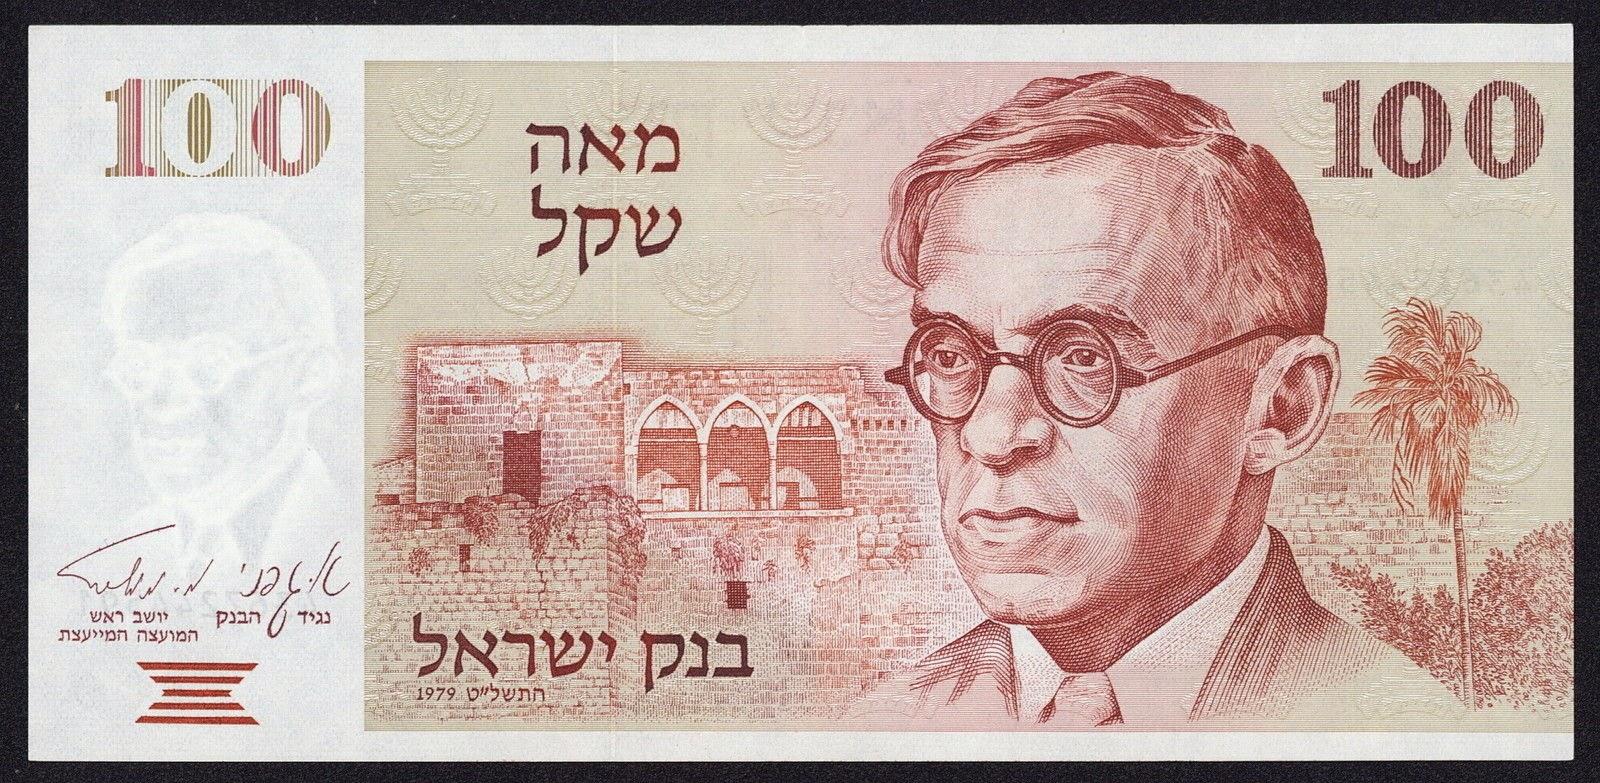 Israel banknotes 100 Sheqalim note 1979 Ze'ev Jabotinsky